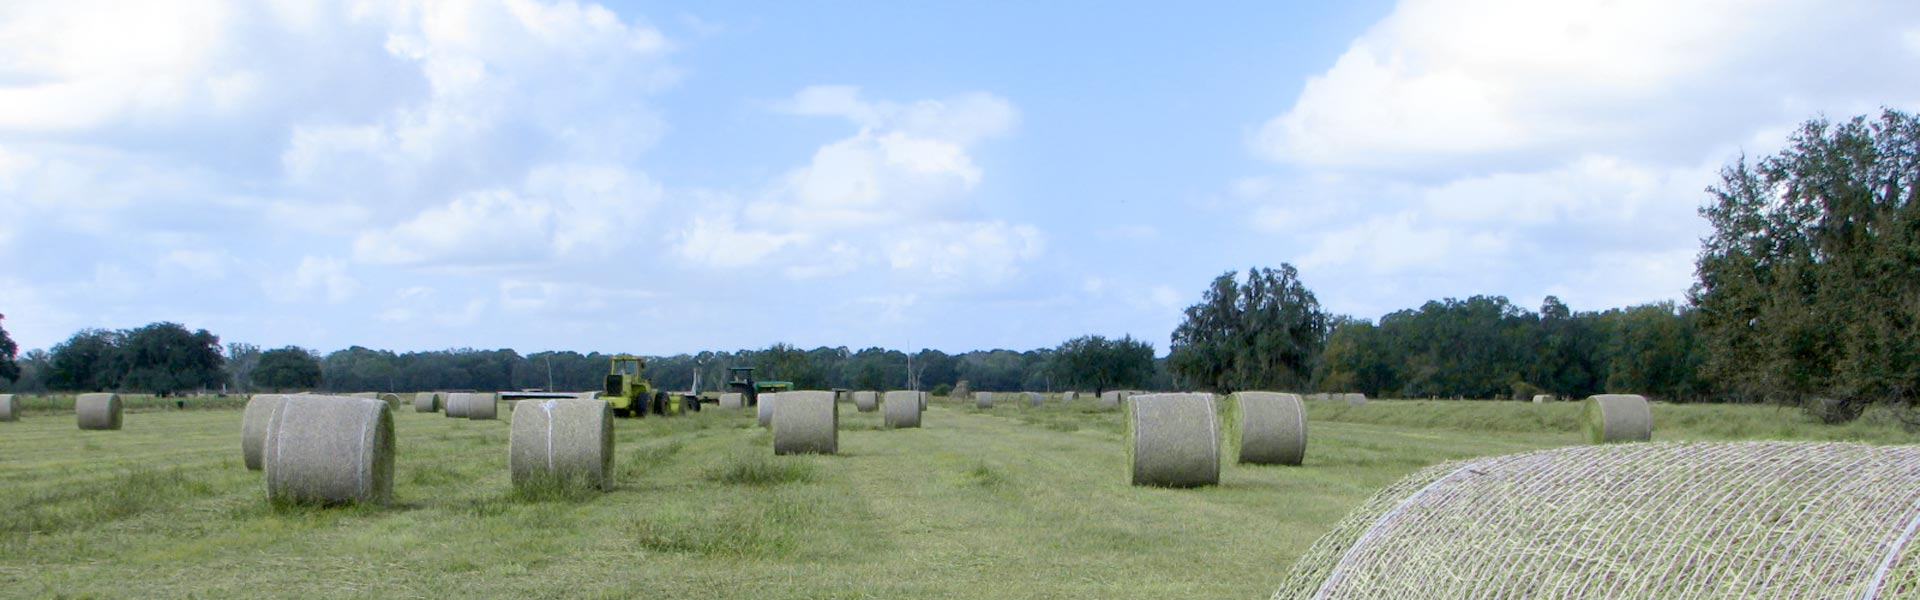 Farm-Land_rev